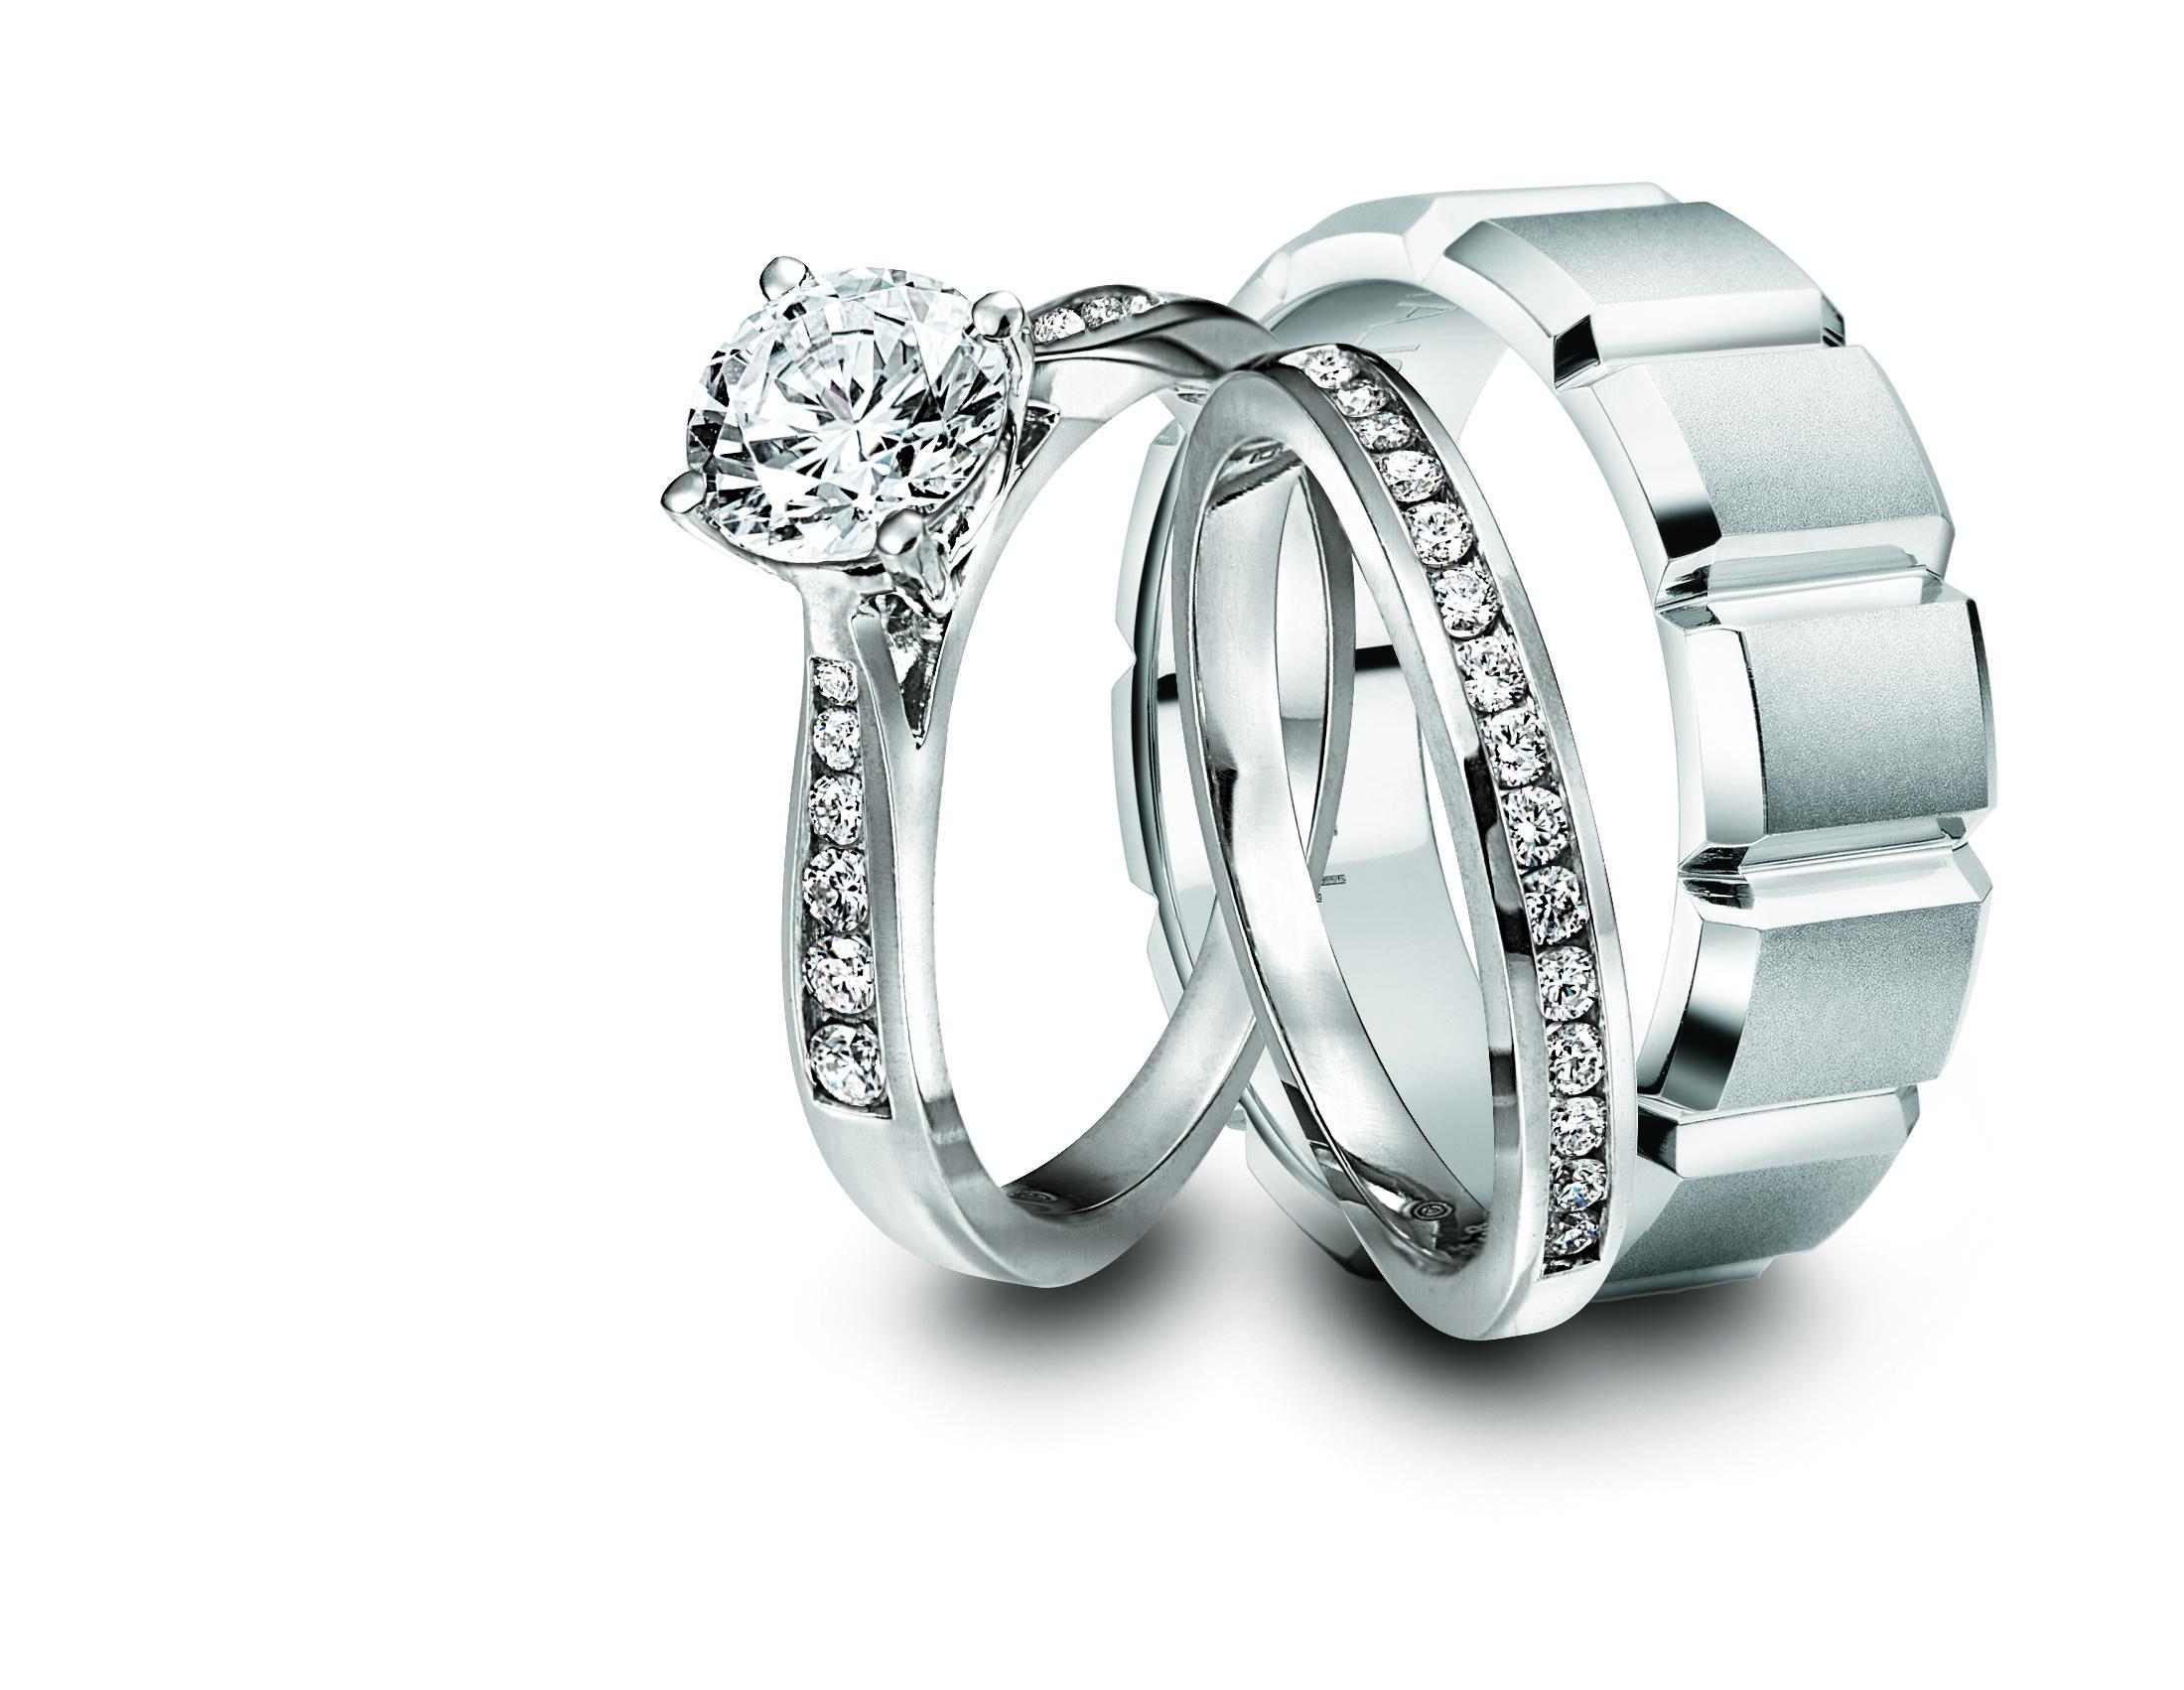 Original Platinum Wedding Rings For Him 13 Following Inspirational Design